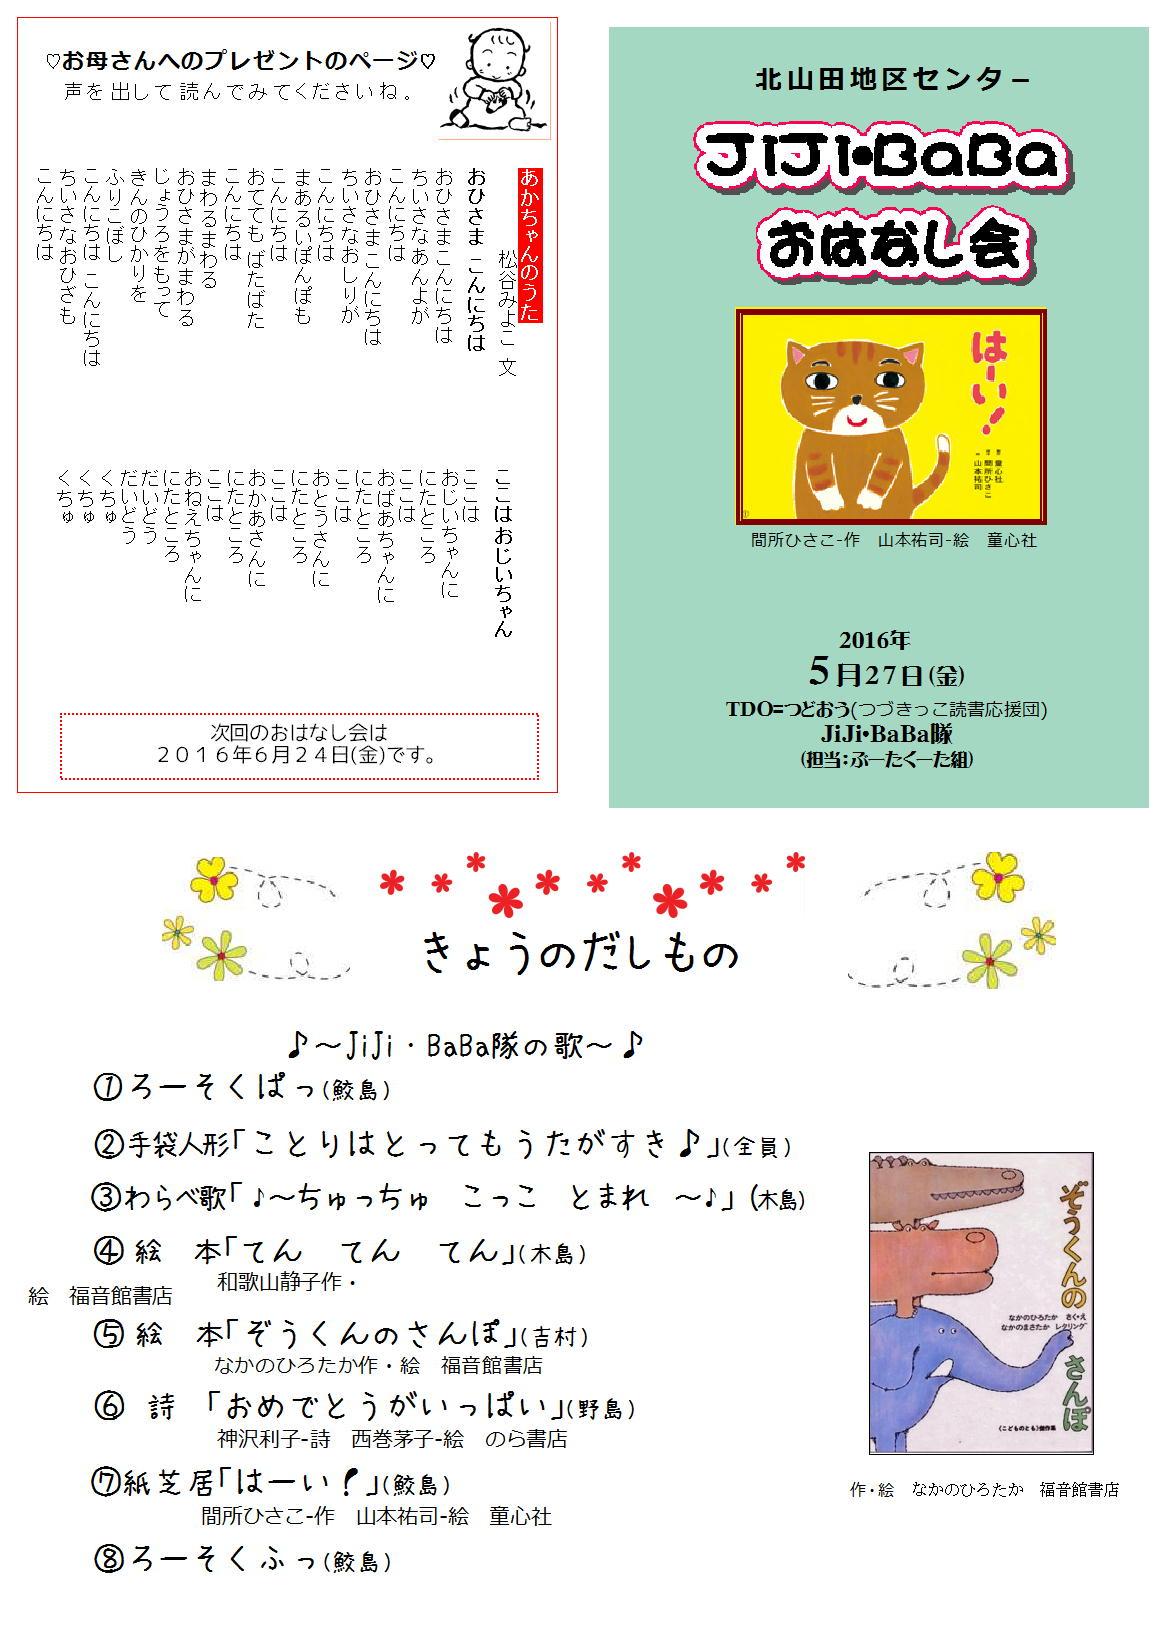 jjbb-1-005